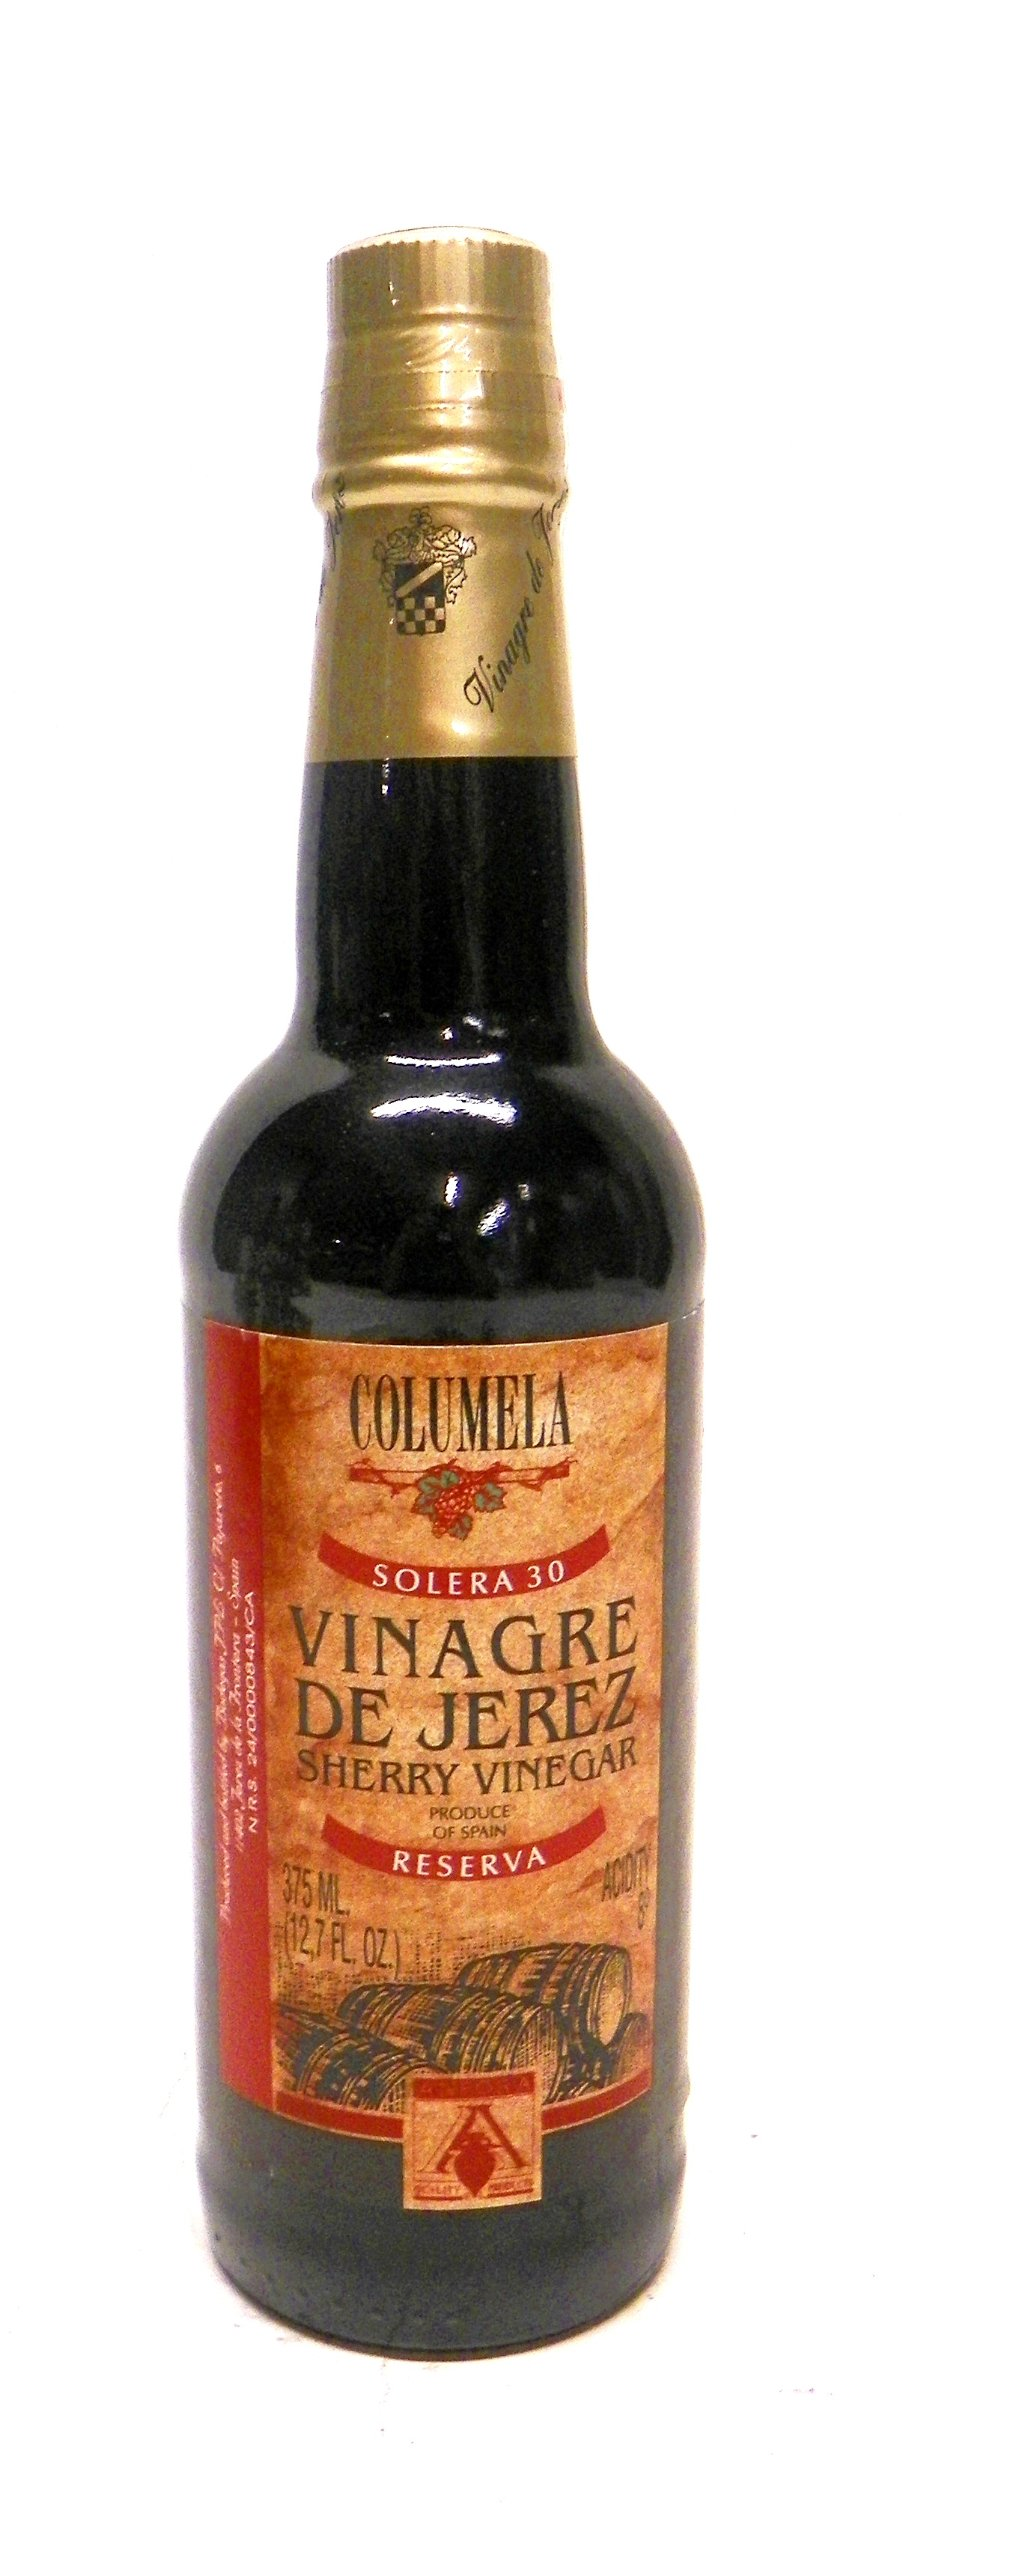 Columela 30 Year Sherry Vinegar, 12.7 Ounce